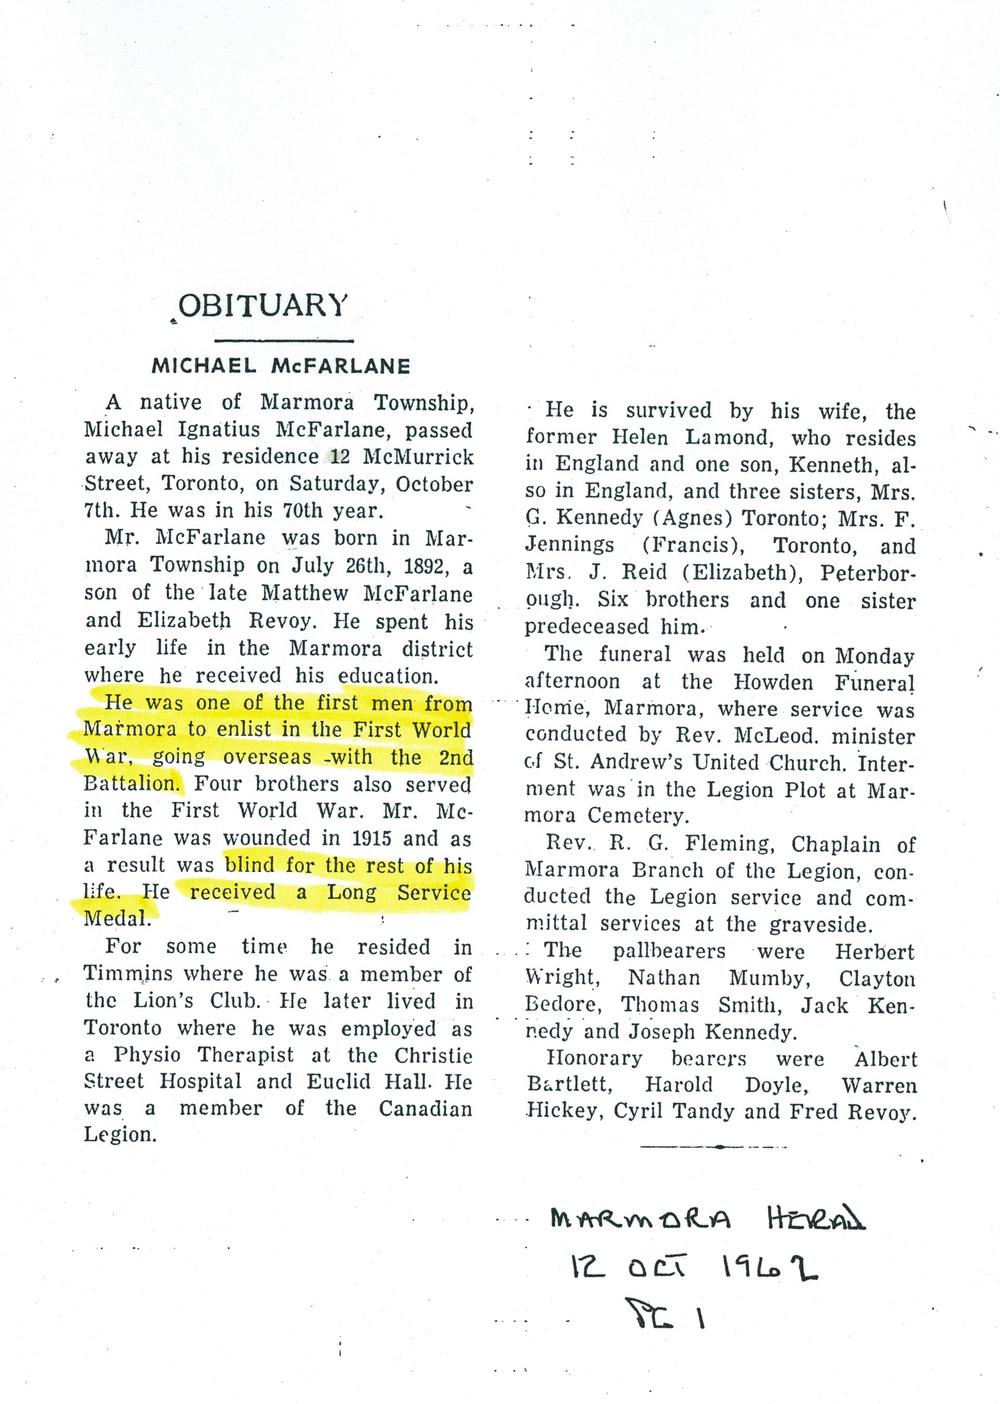 McFarlane,  Michael,  1892-1962.jpg